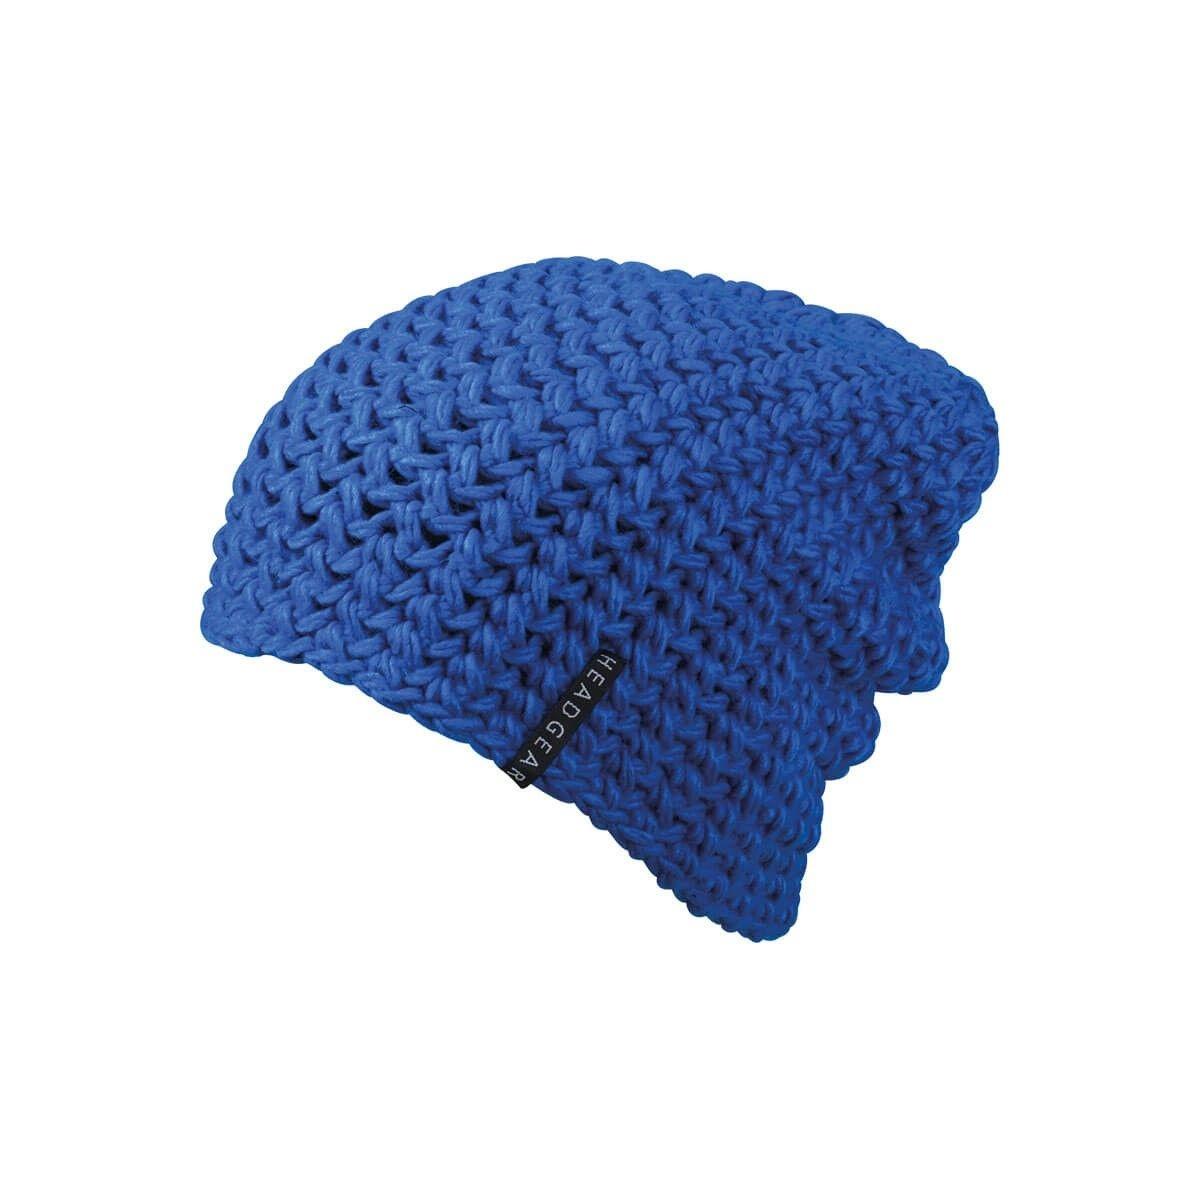 Bonnet crochet grande taille